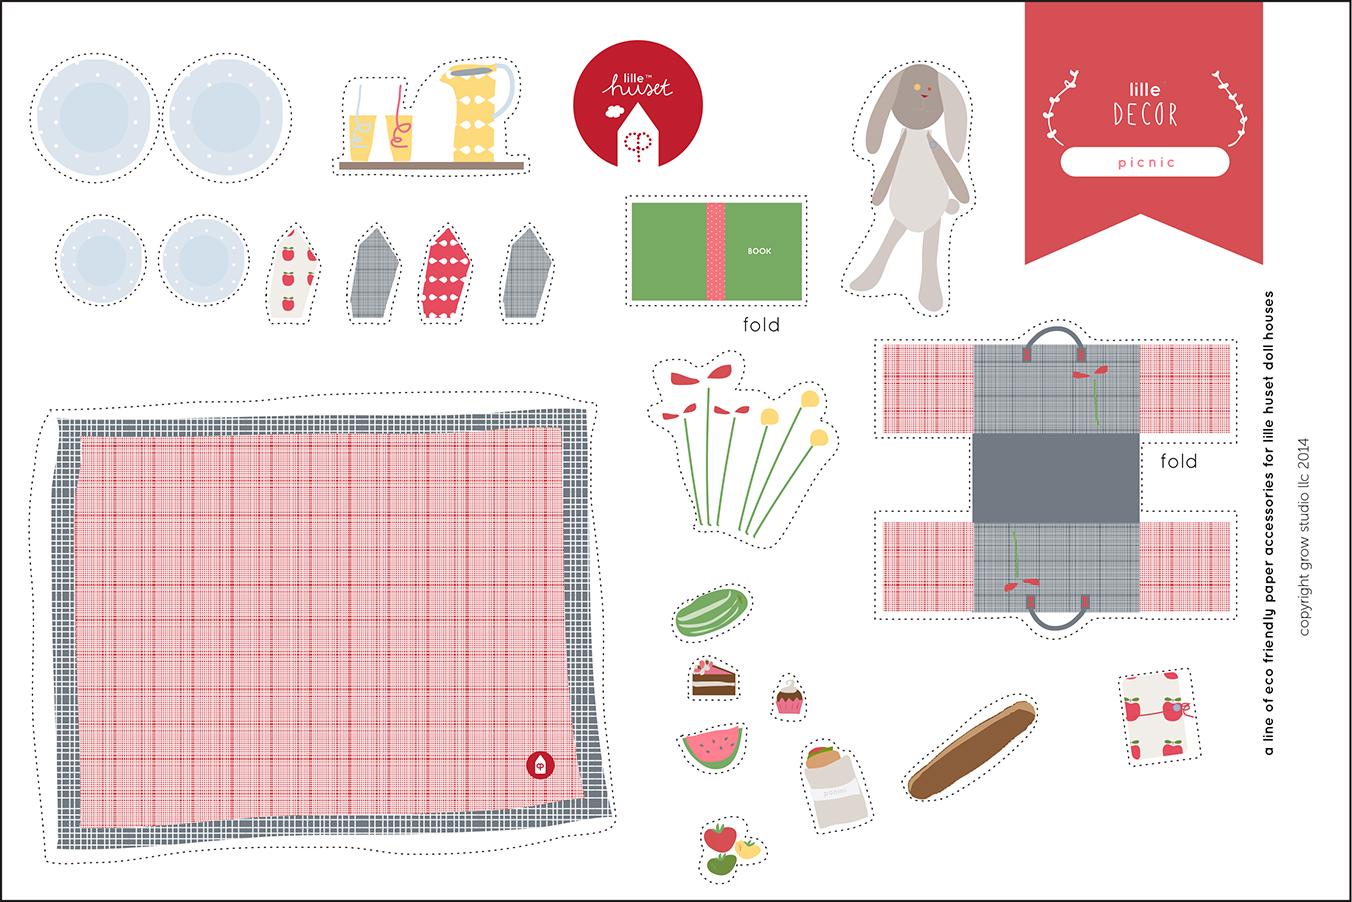 dollhouse free download picnic